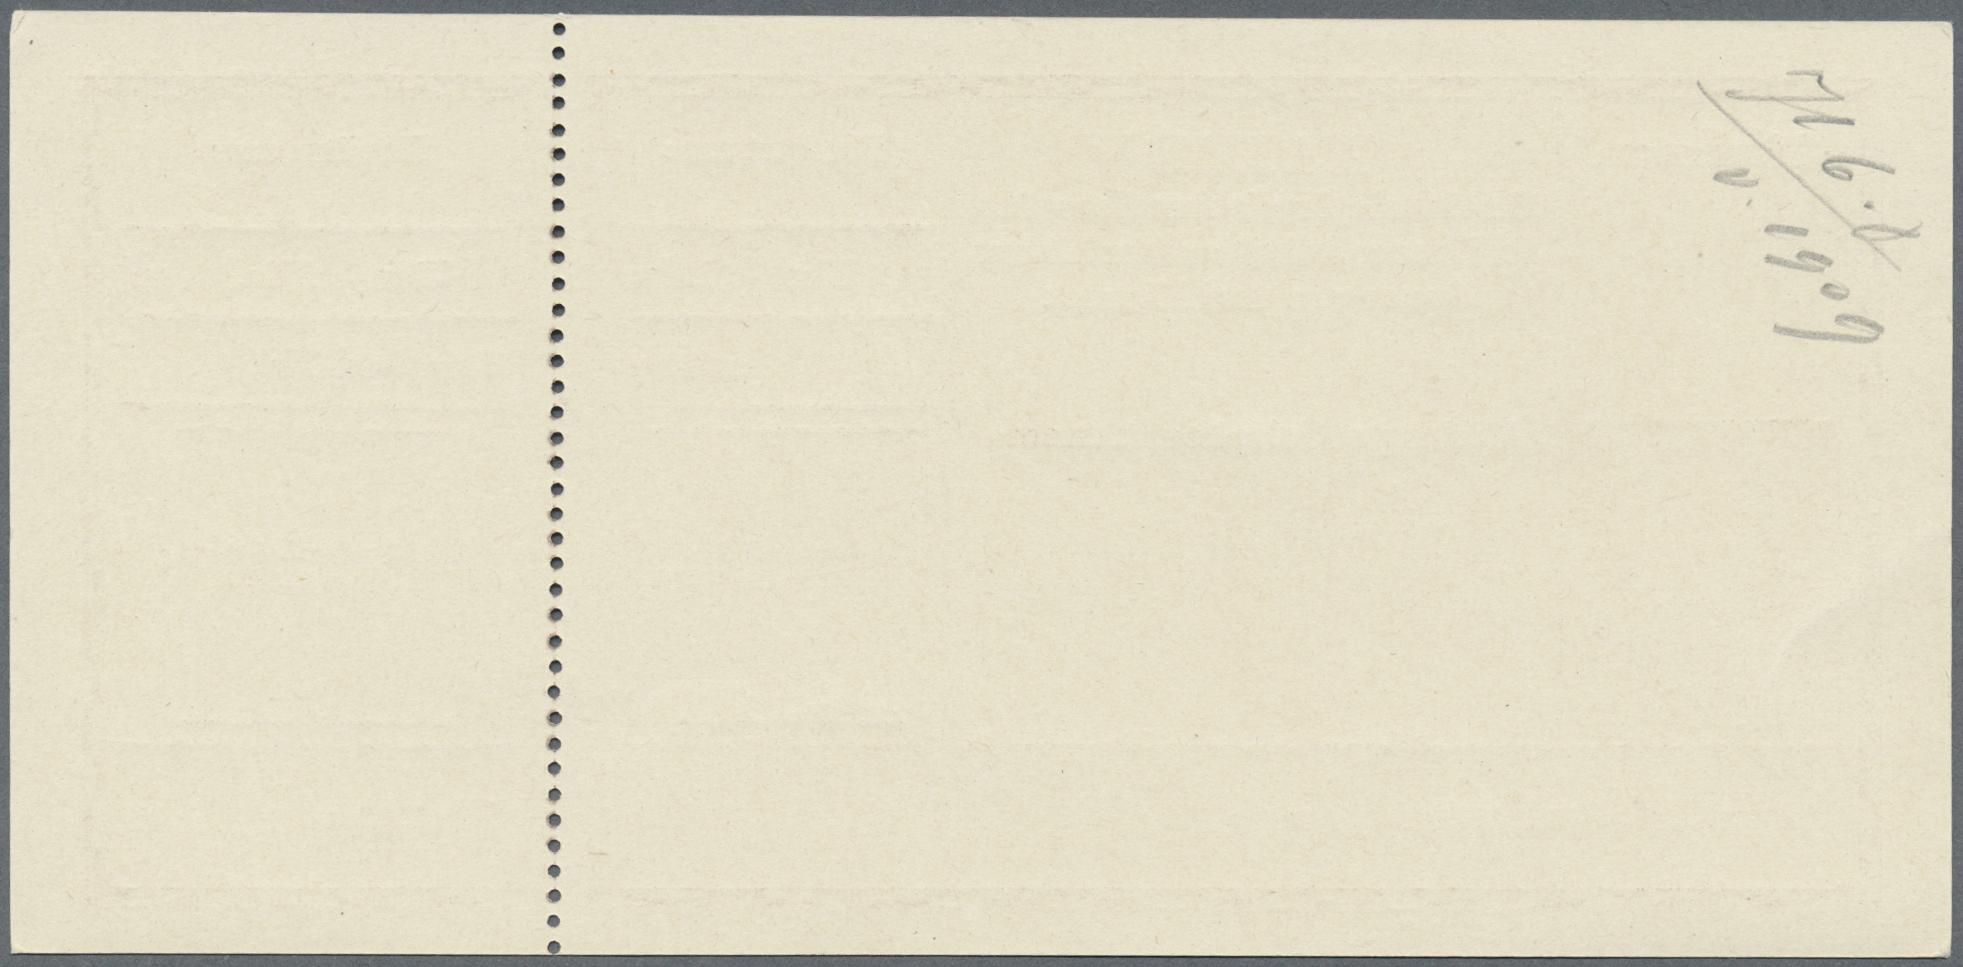 Lot 18239 - österreich - ganzsachen  -  Auktionshaus Christoph Gärtner GmbH & Co. KG Single lots Philately Overseas & Europe. Auction #39 Day 4